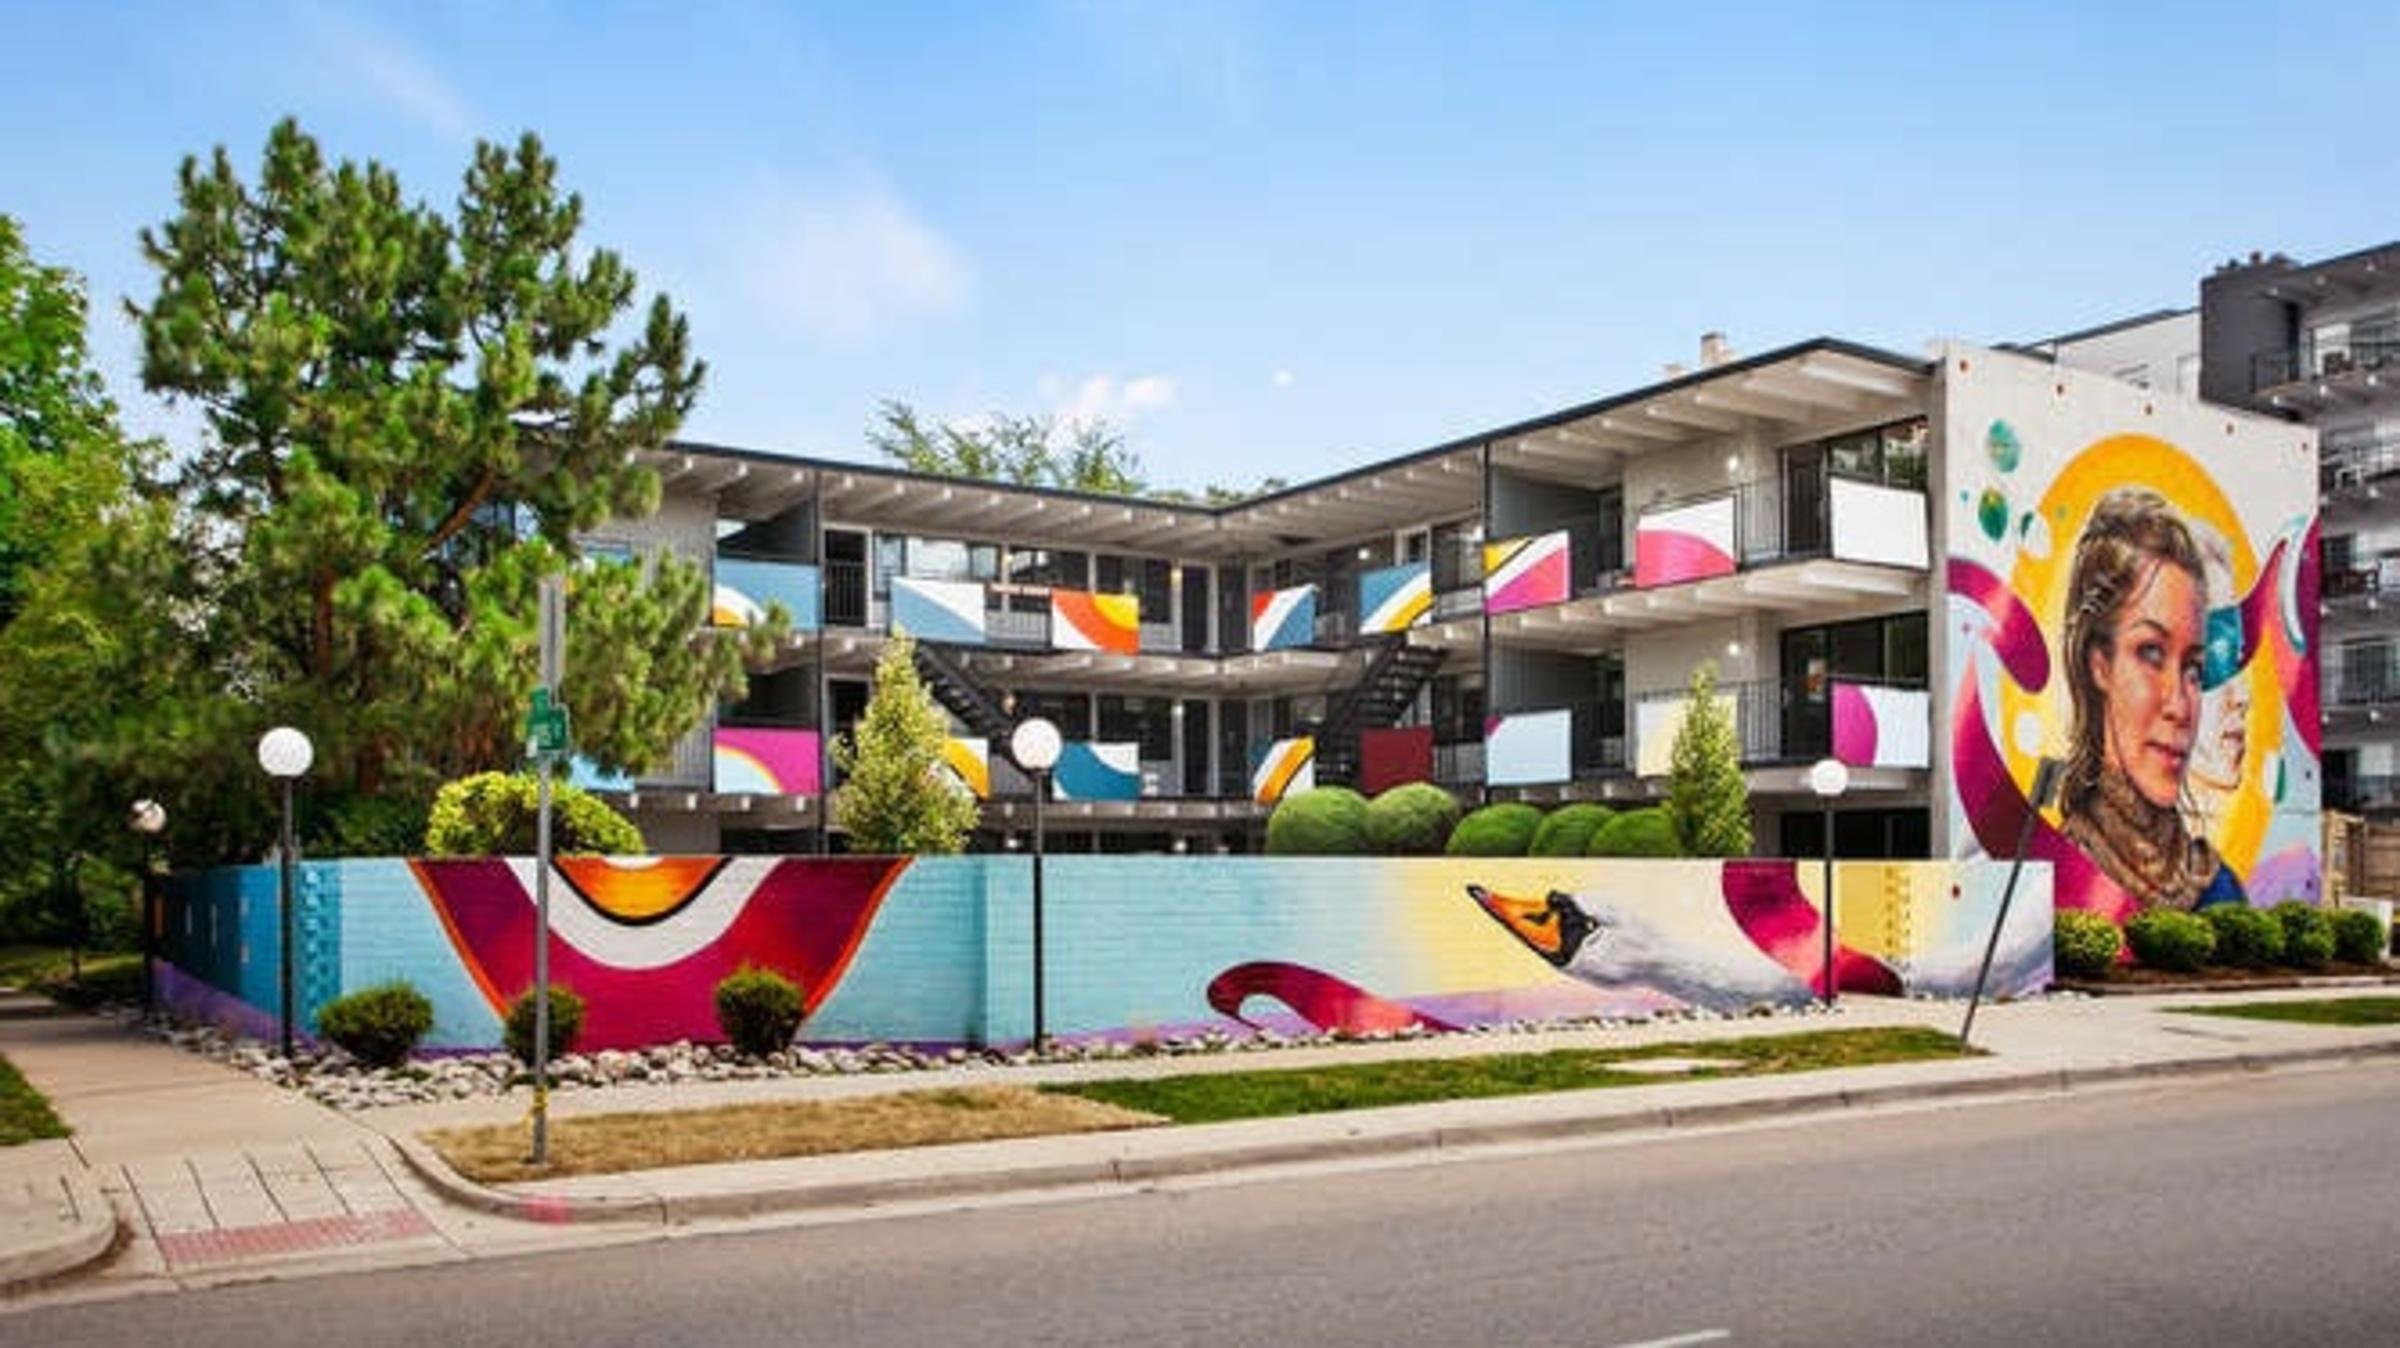 Grant St Apartments